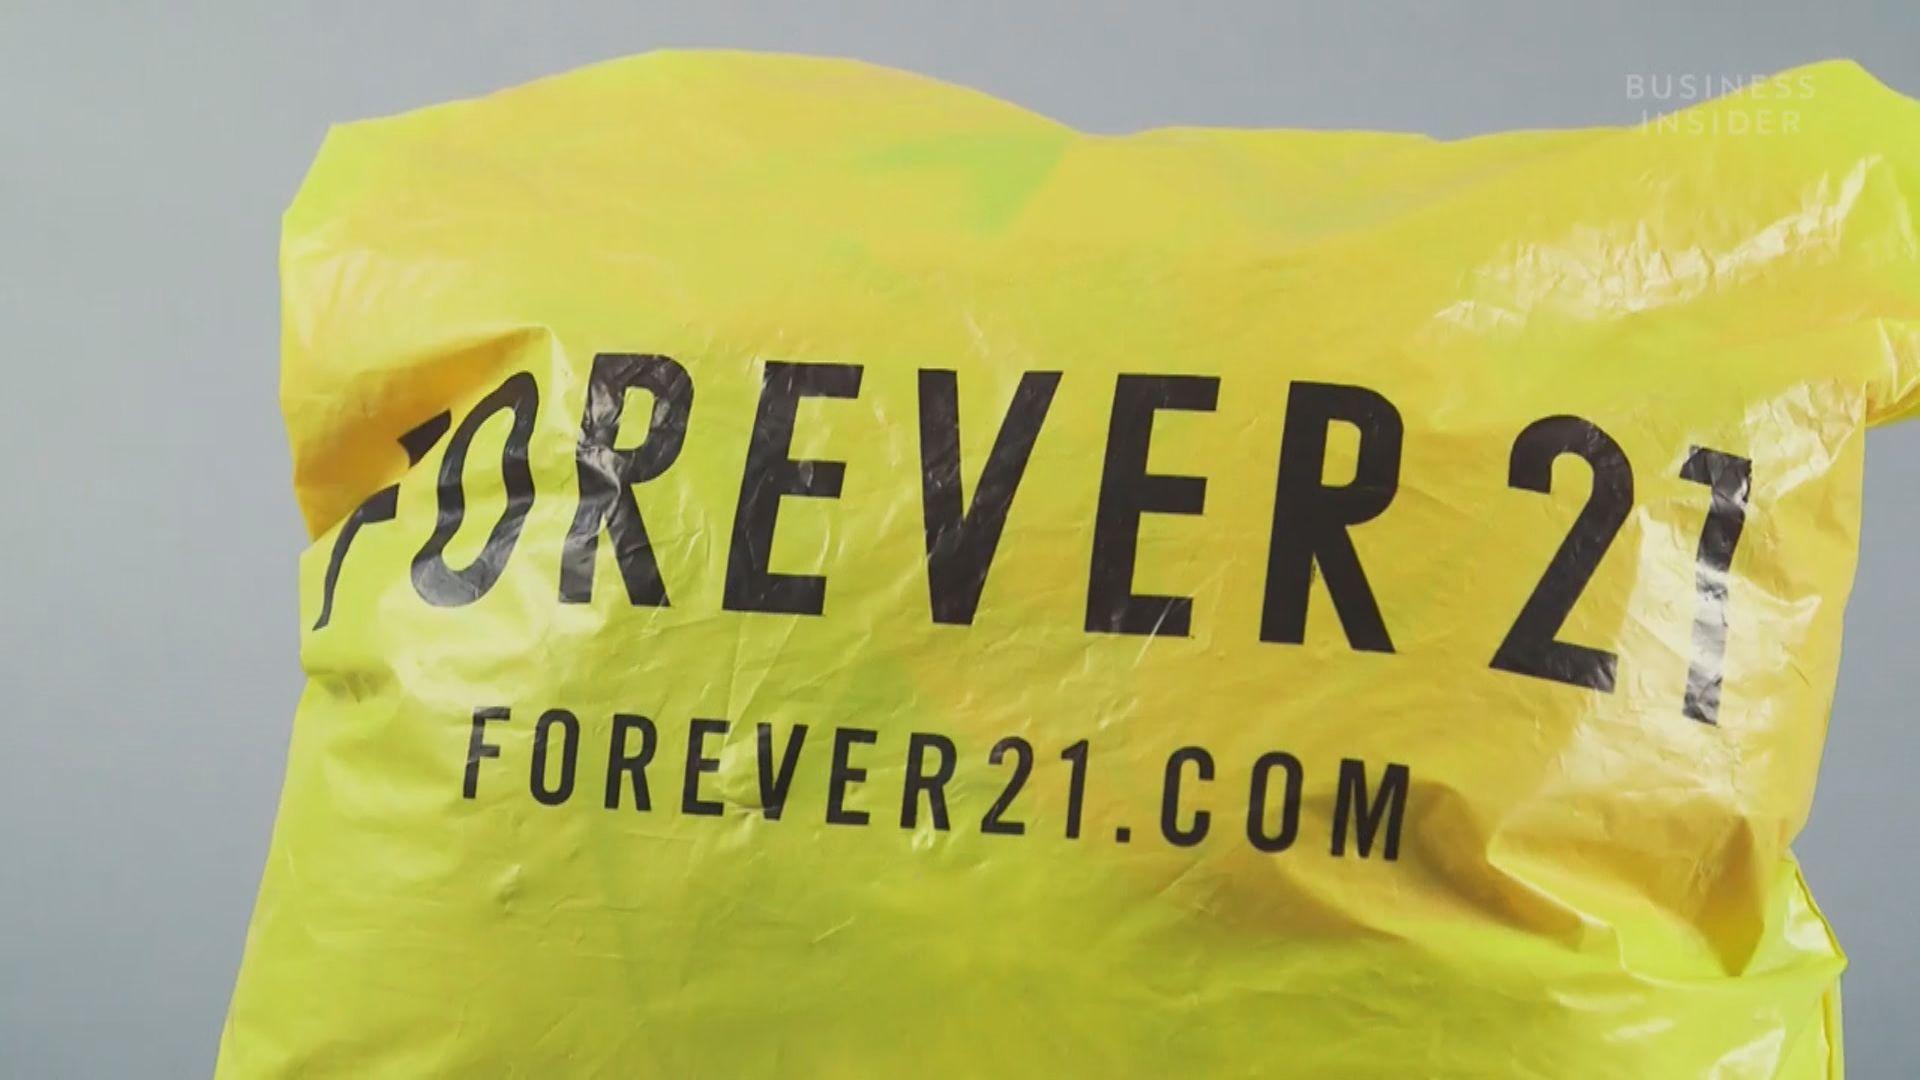 時裝品牌Forever 21申請破產保護